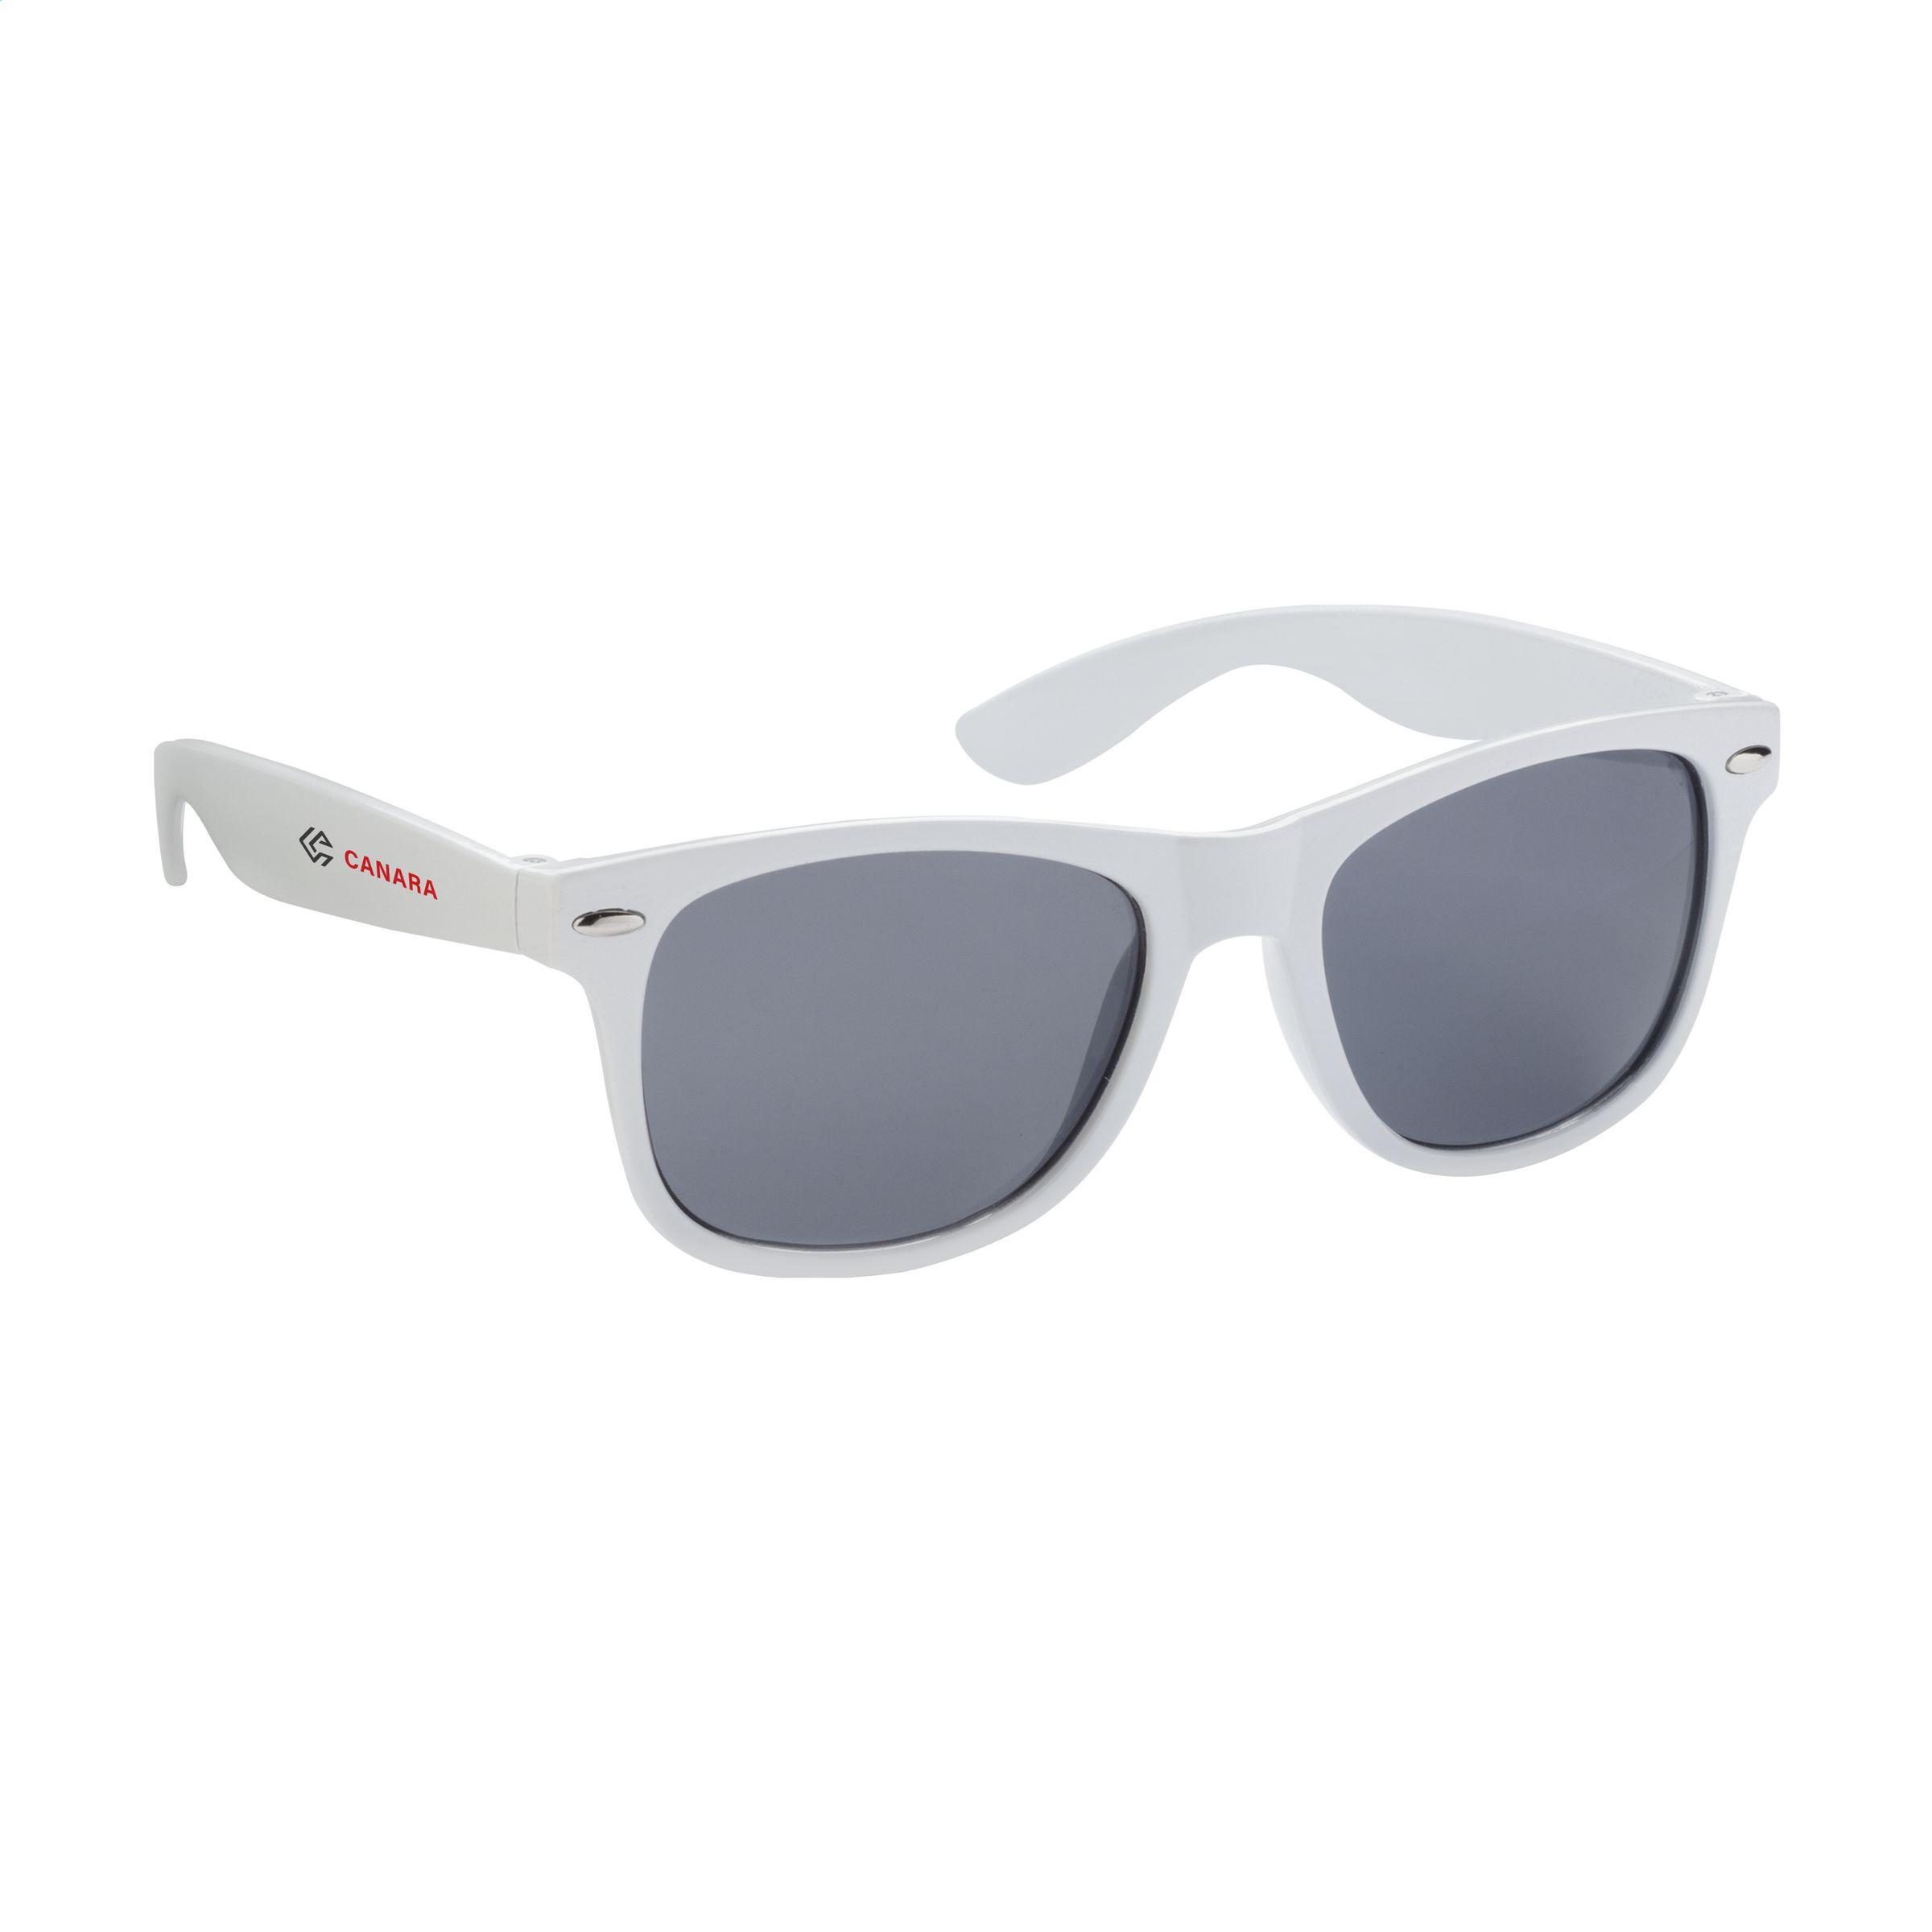 impresión de Malibu lunettes de soleil